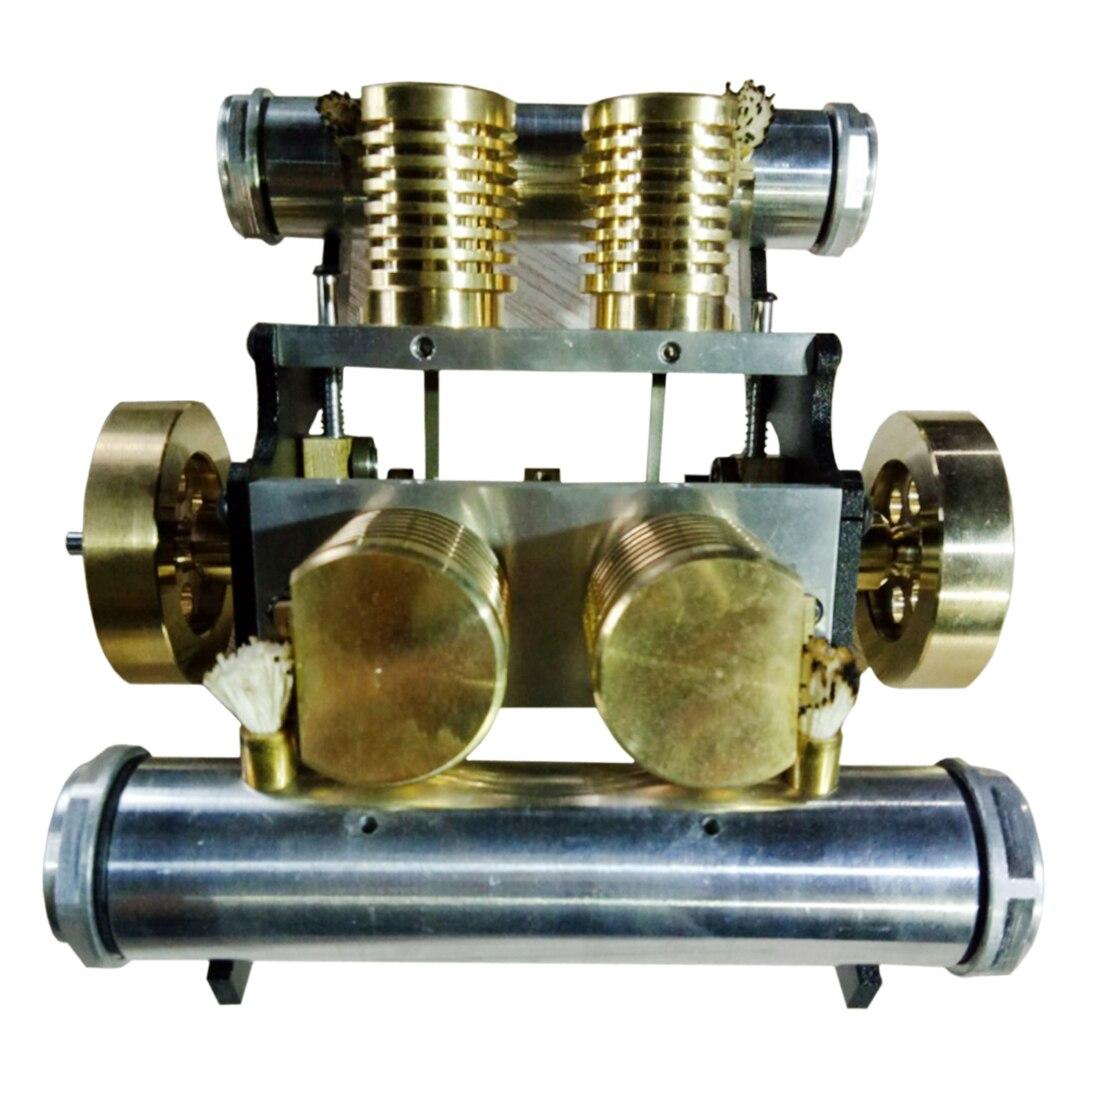 V-shape Four-cylinder Vacuum Suction Engine Model Building Kits Toy for Developing IntelligenceV-shape Four-cylinder Vacuum Suction Engine Model Building Kits Toy for Developing Intelligence